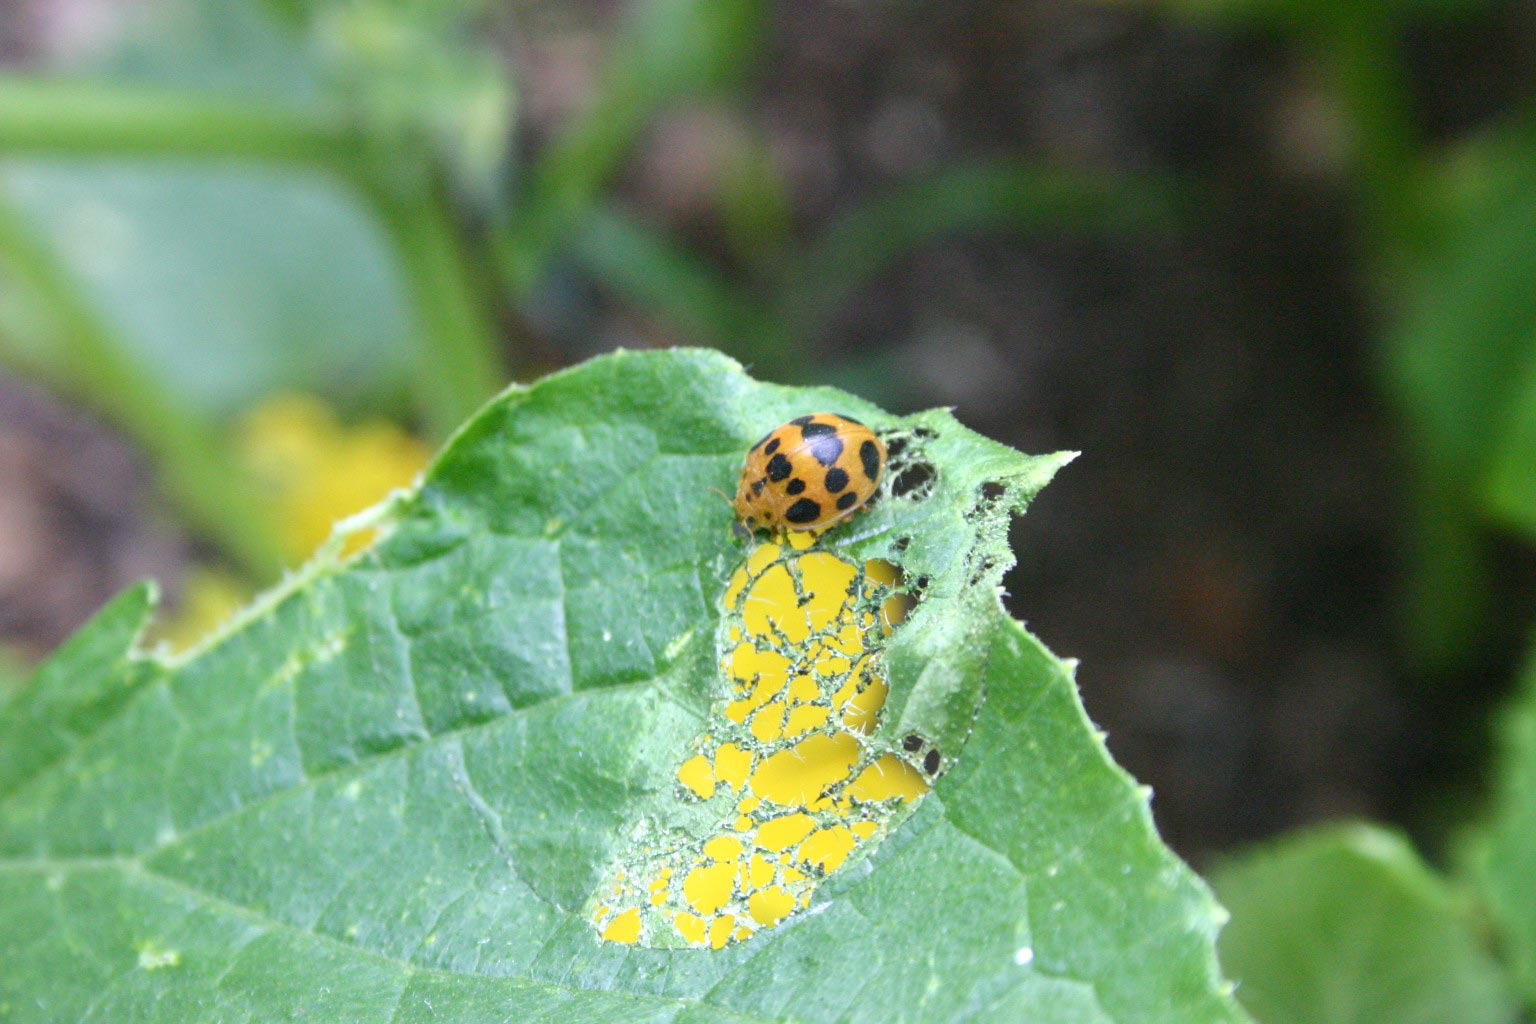 Mexican bean beetle on squash